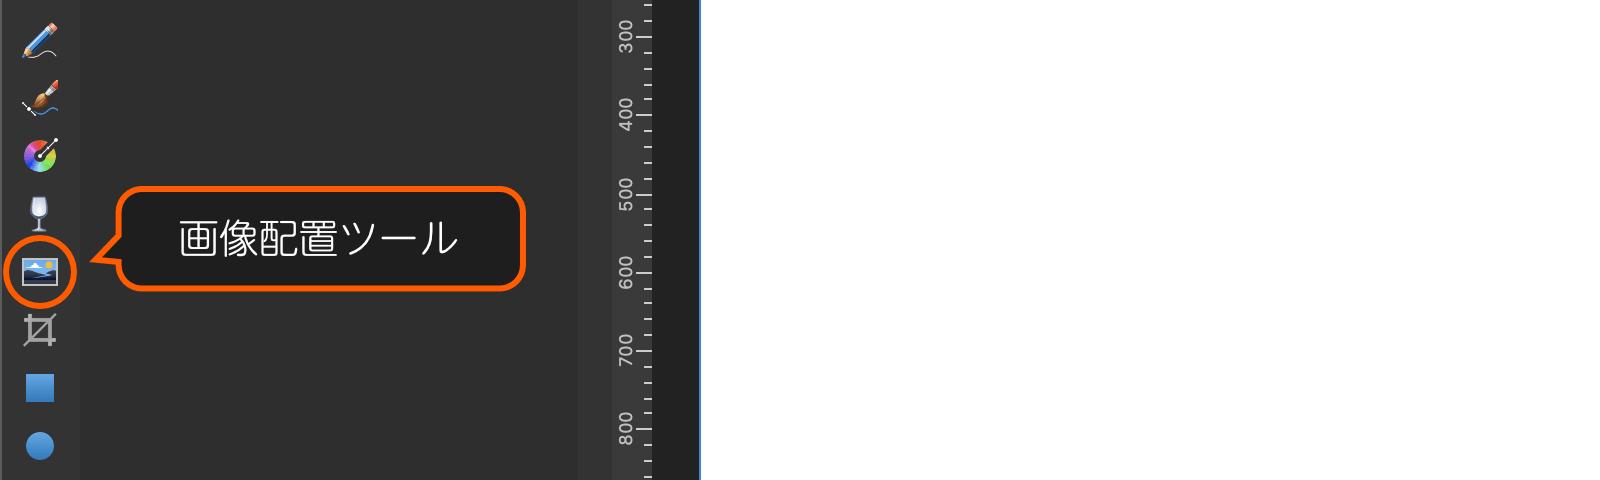 Affinity Designerのツールにある画像配置ツールのキャプチャ画像